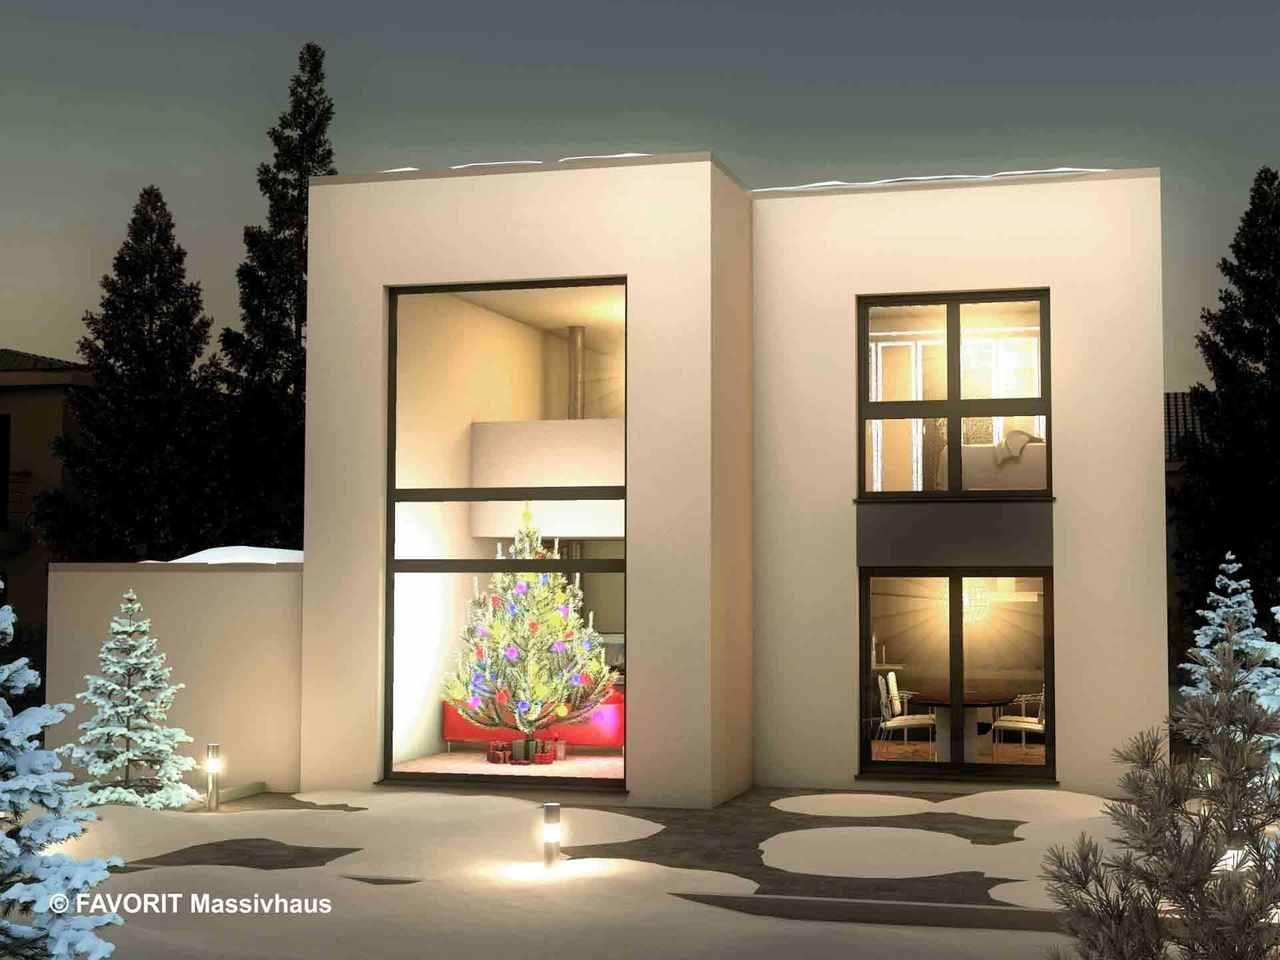 Concept Design 149 - FAVORIT MASSIVHAUS Terrasse am Abend